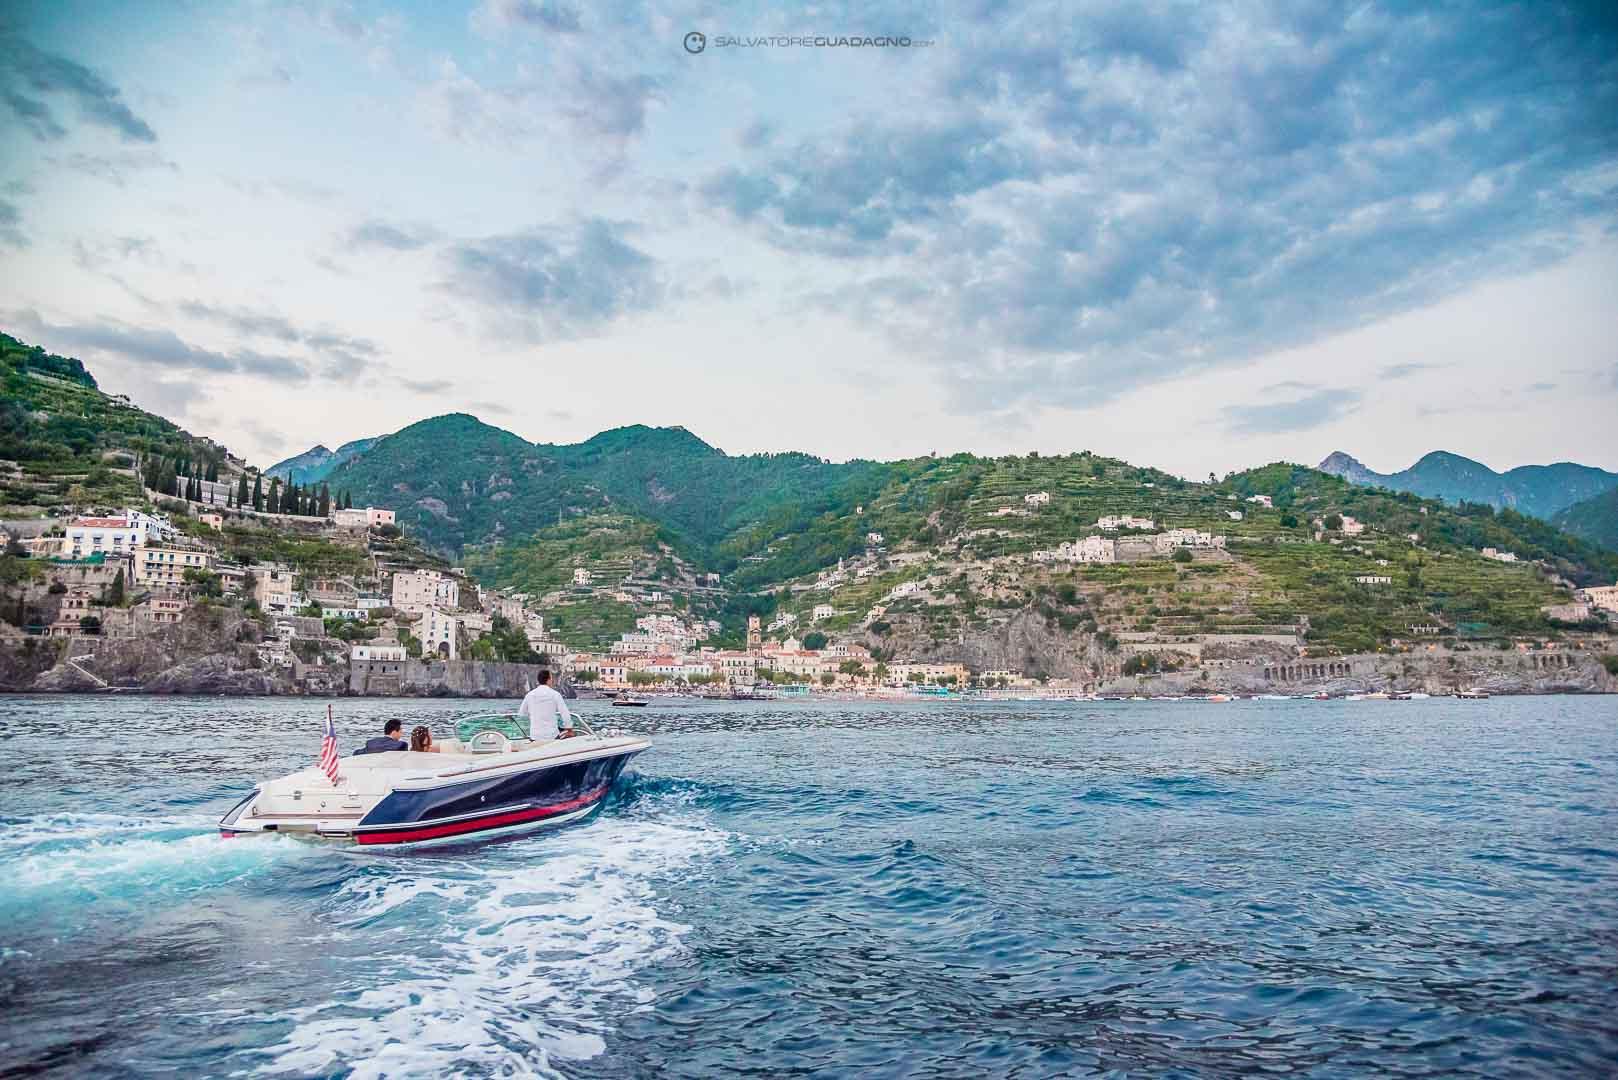 fotografo-matrimonio-barca-costiera-amalfitana